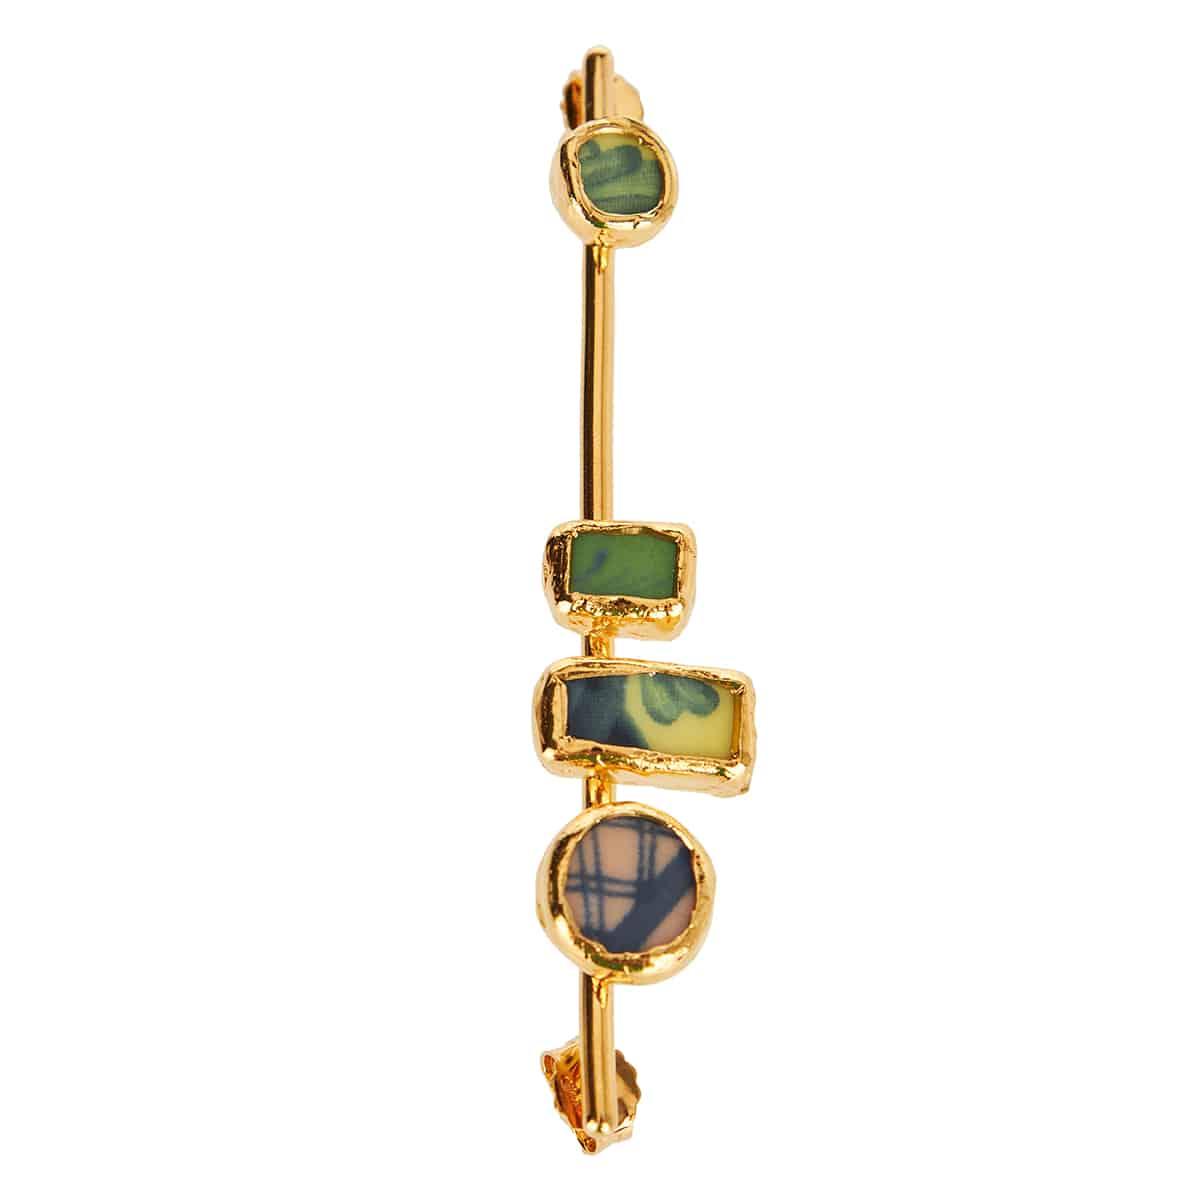 x Federico Curradi Temistocle brass brooch